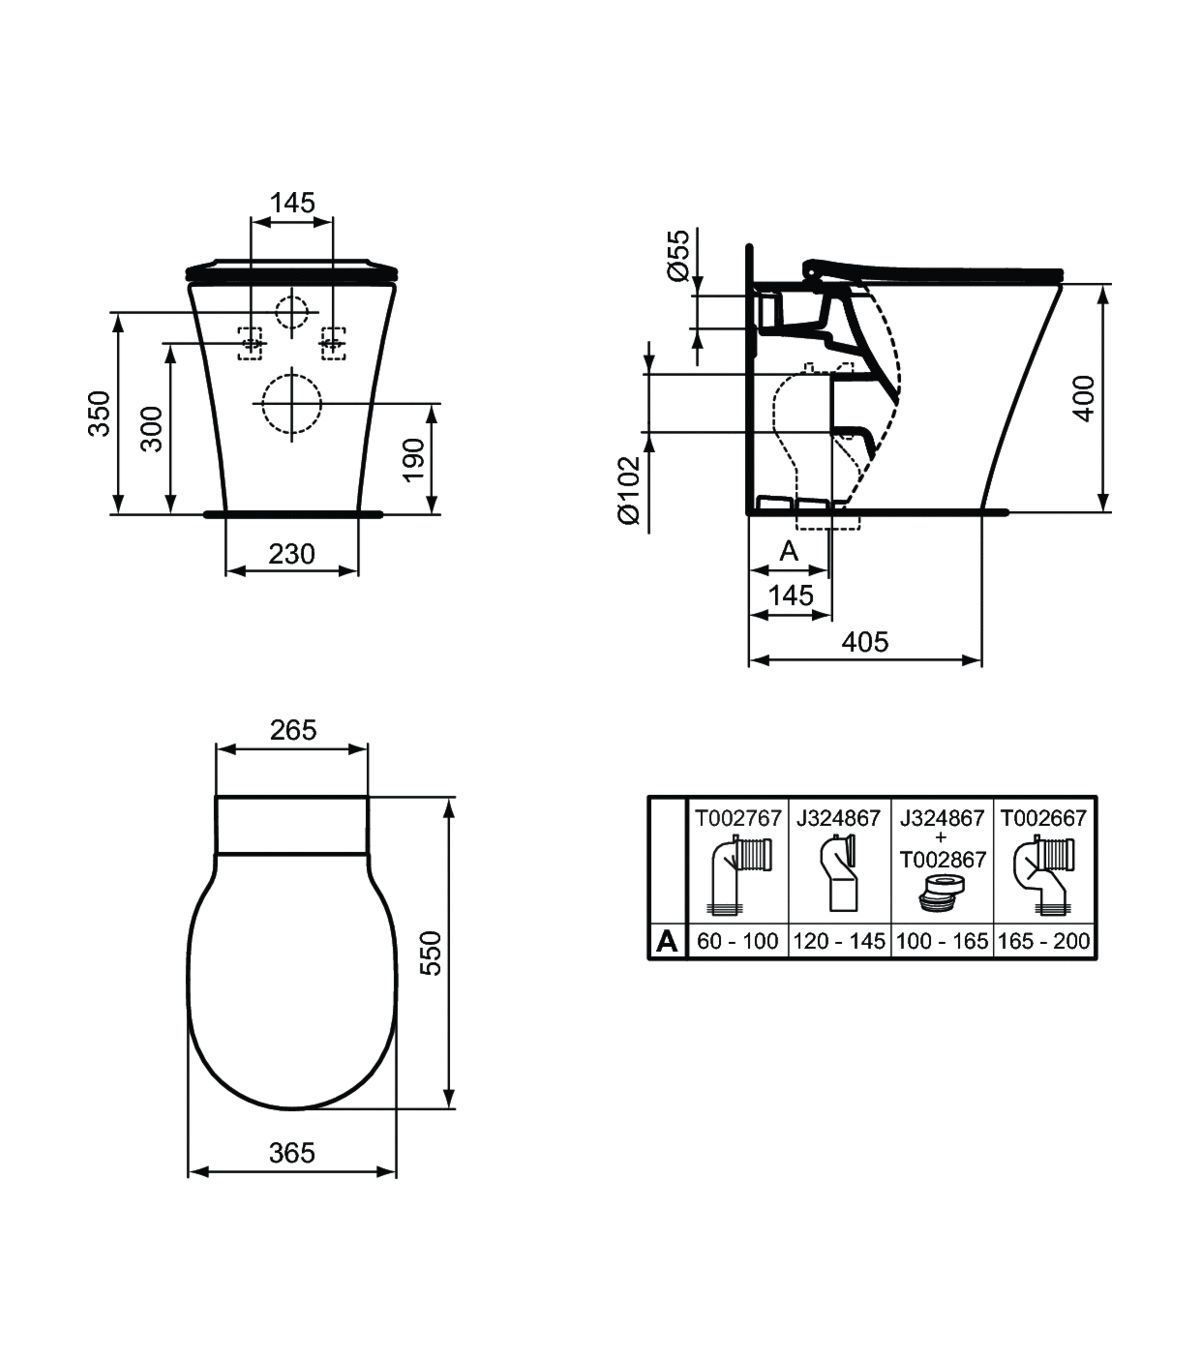 Wc Filo Parete E Sedile Ideal Standard Connect Air